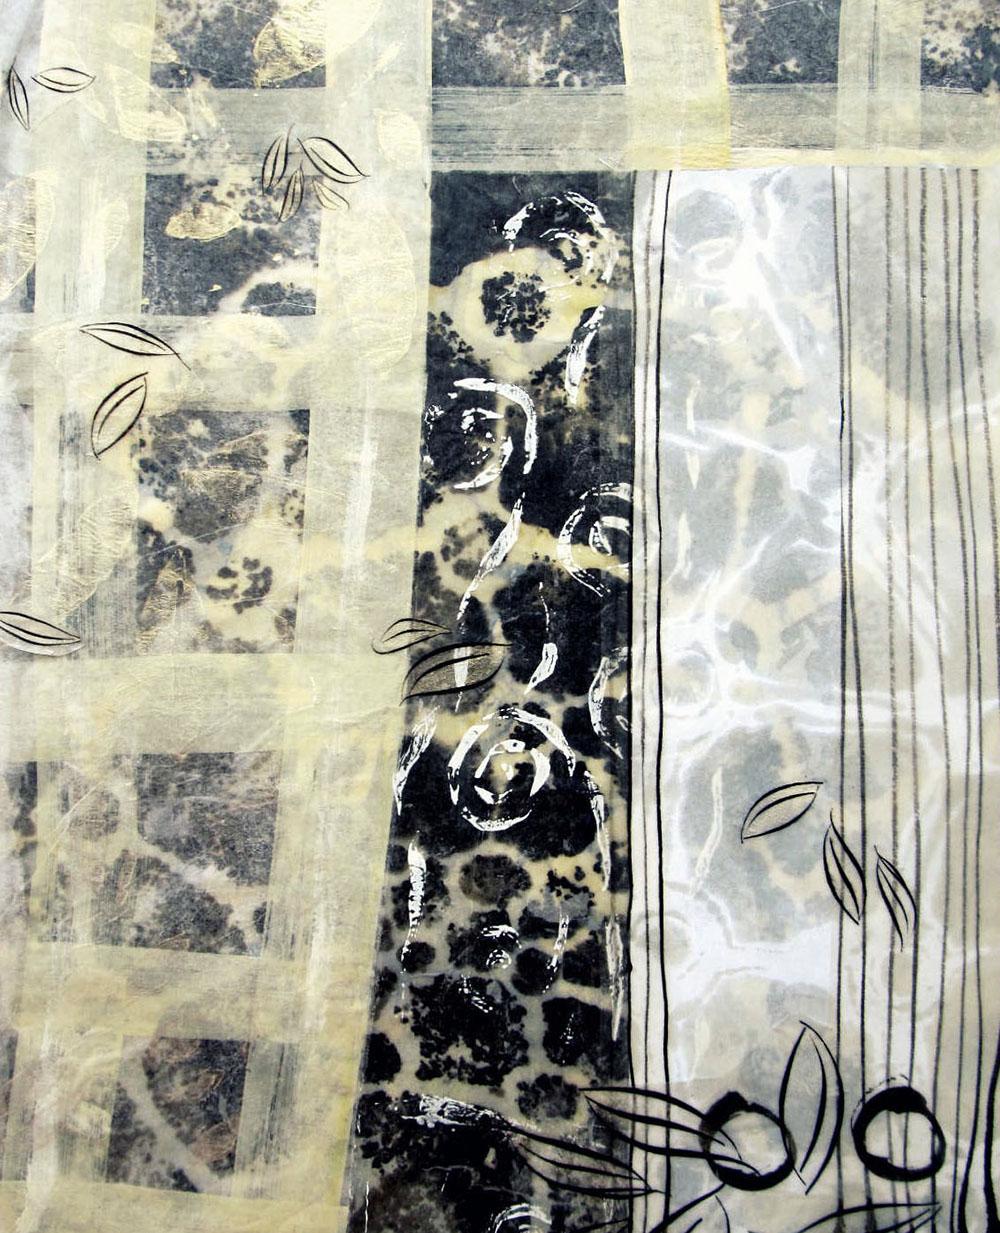 encaustic monotype collage